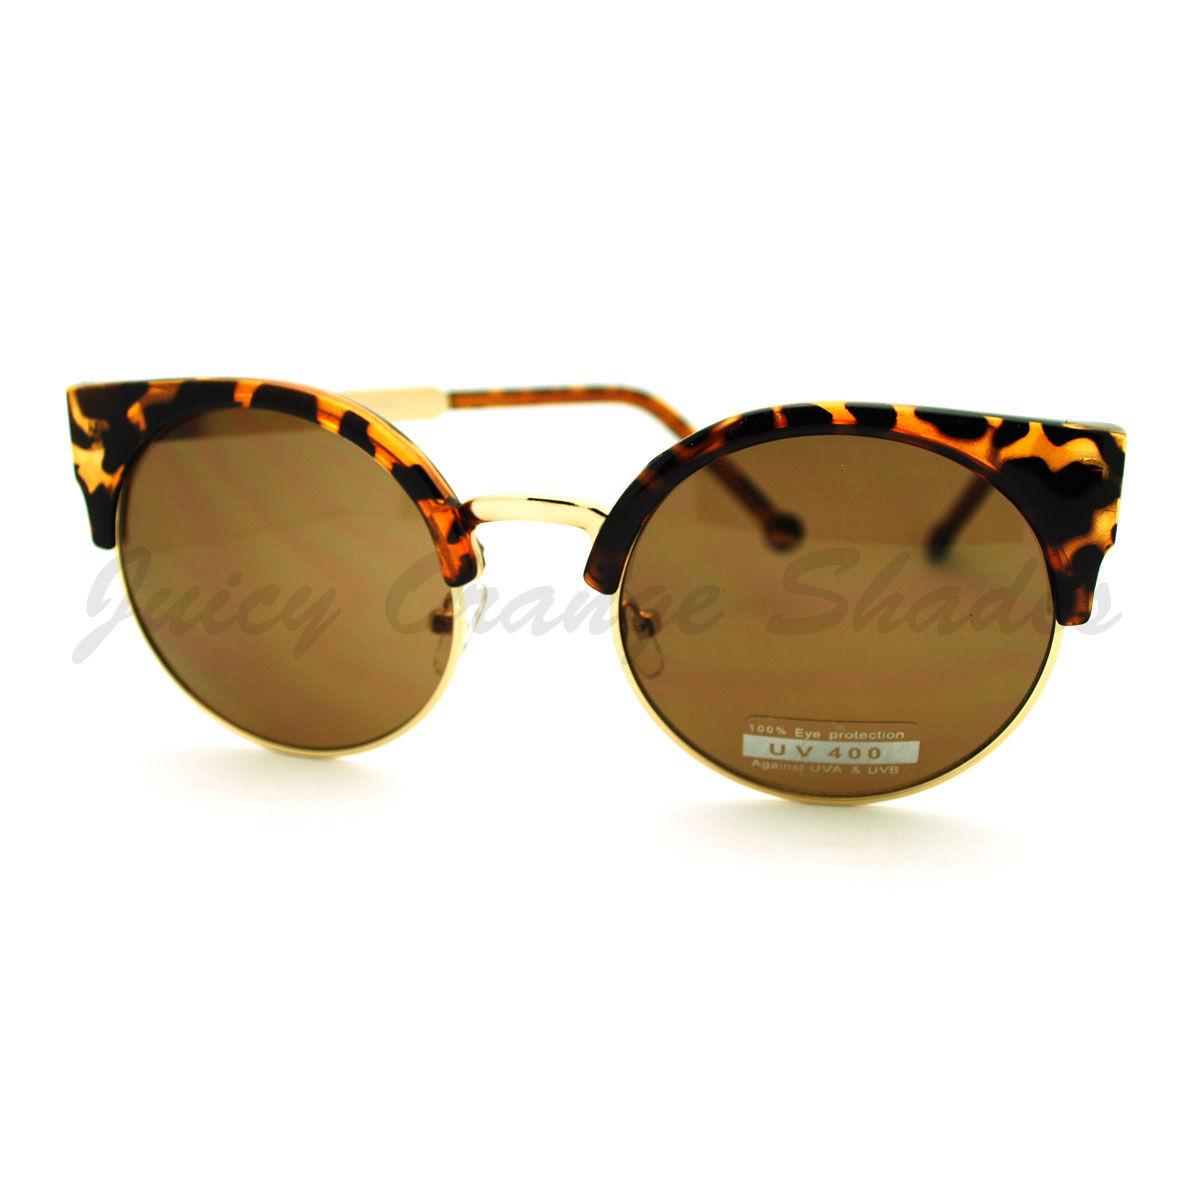 Round Cateye Sunglasses Womens Sexy Retro Fashion Shades